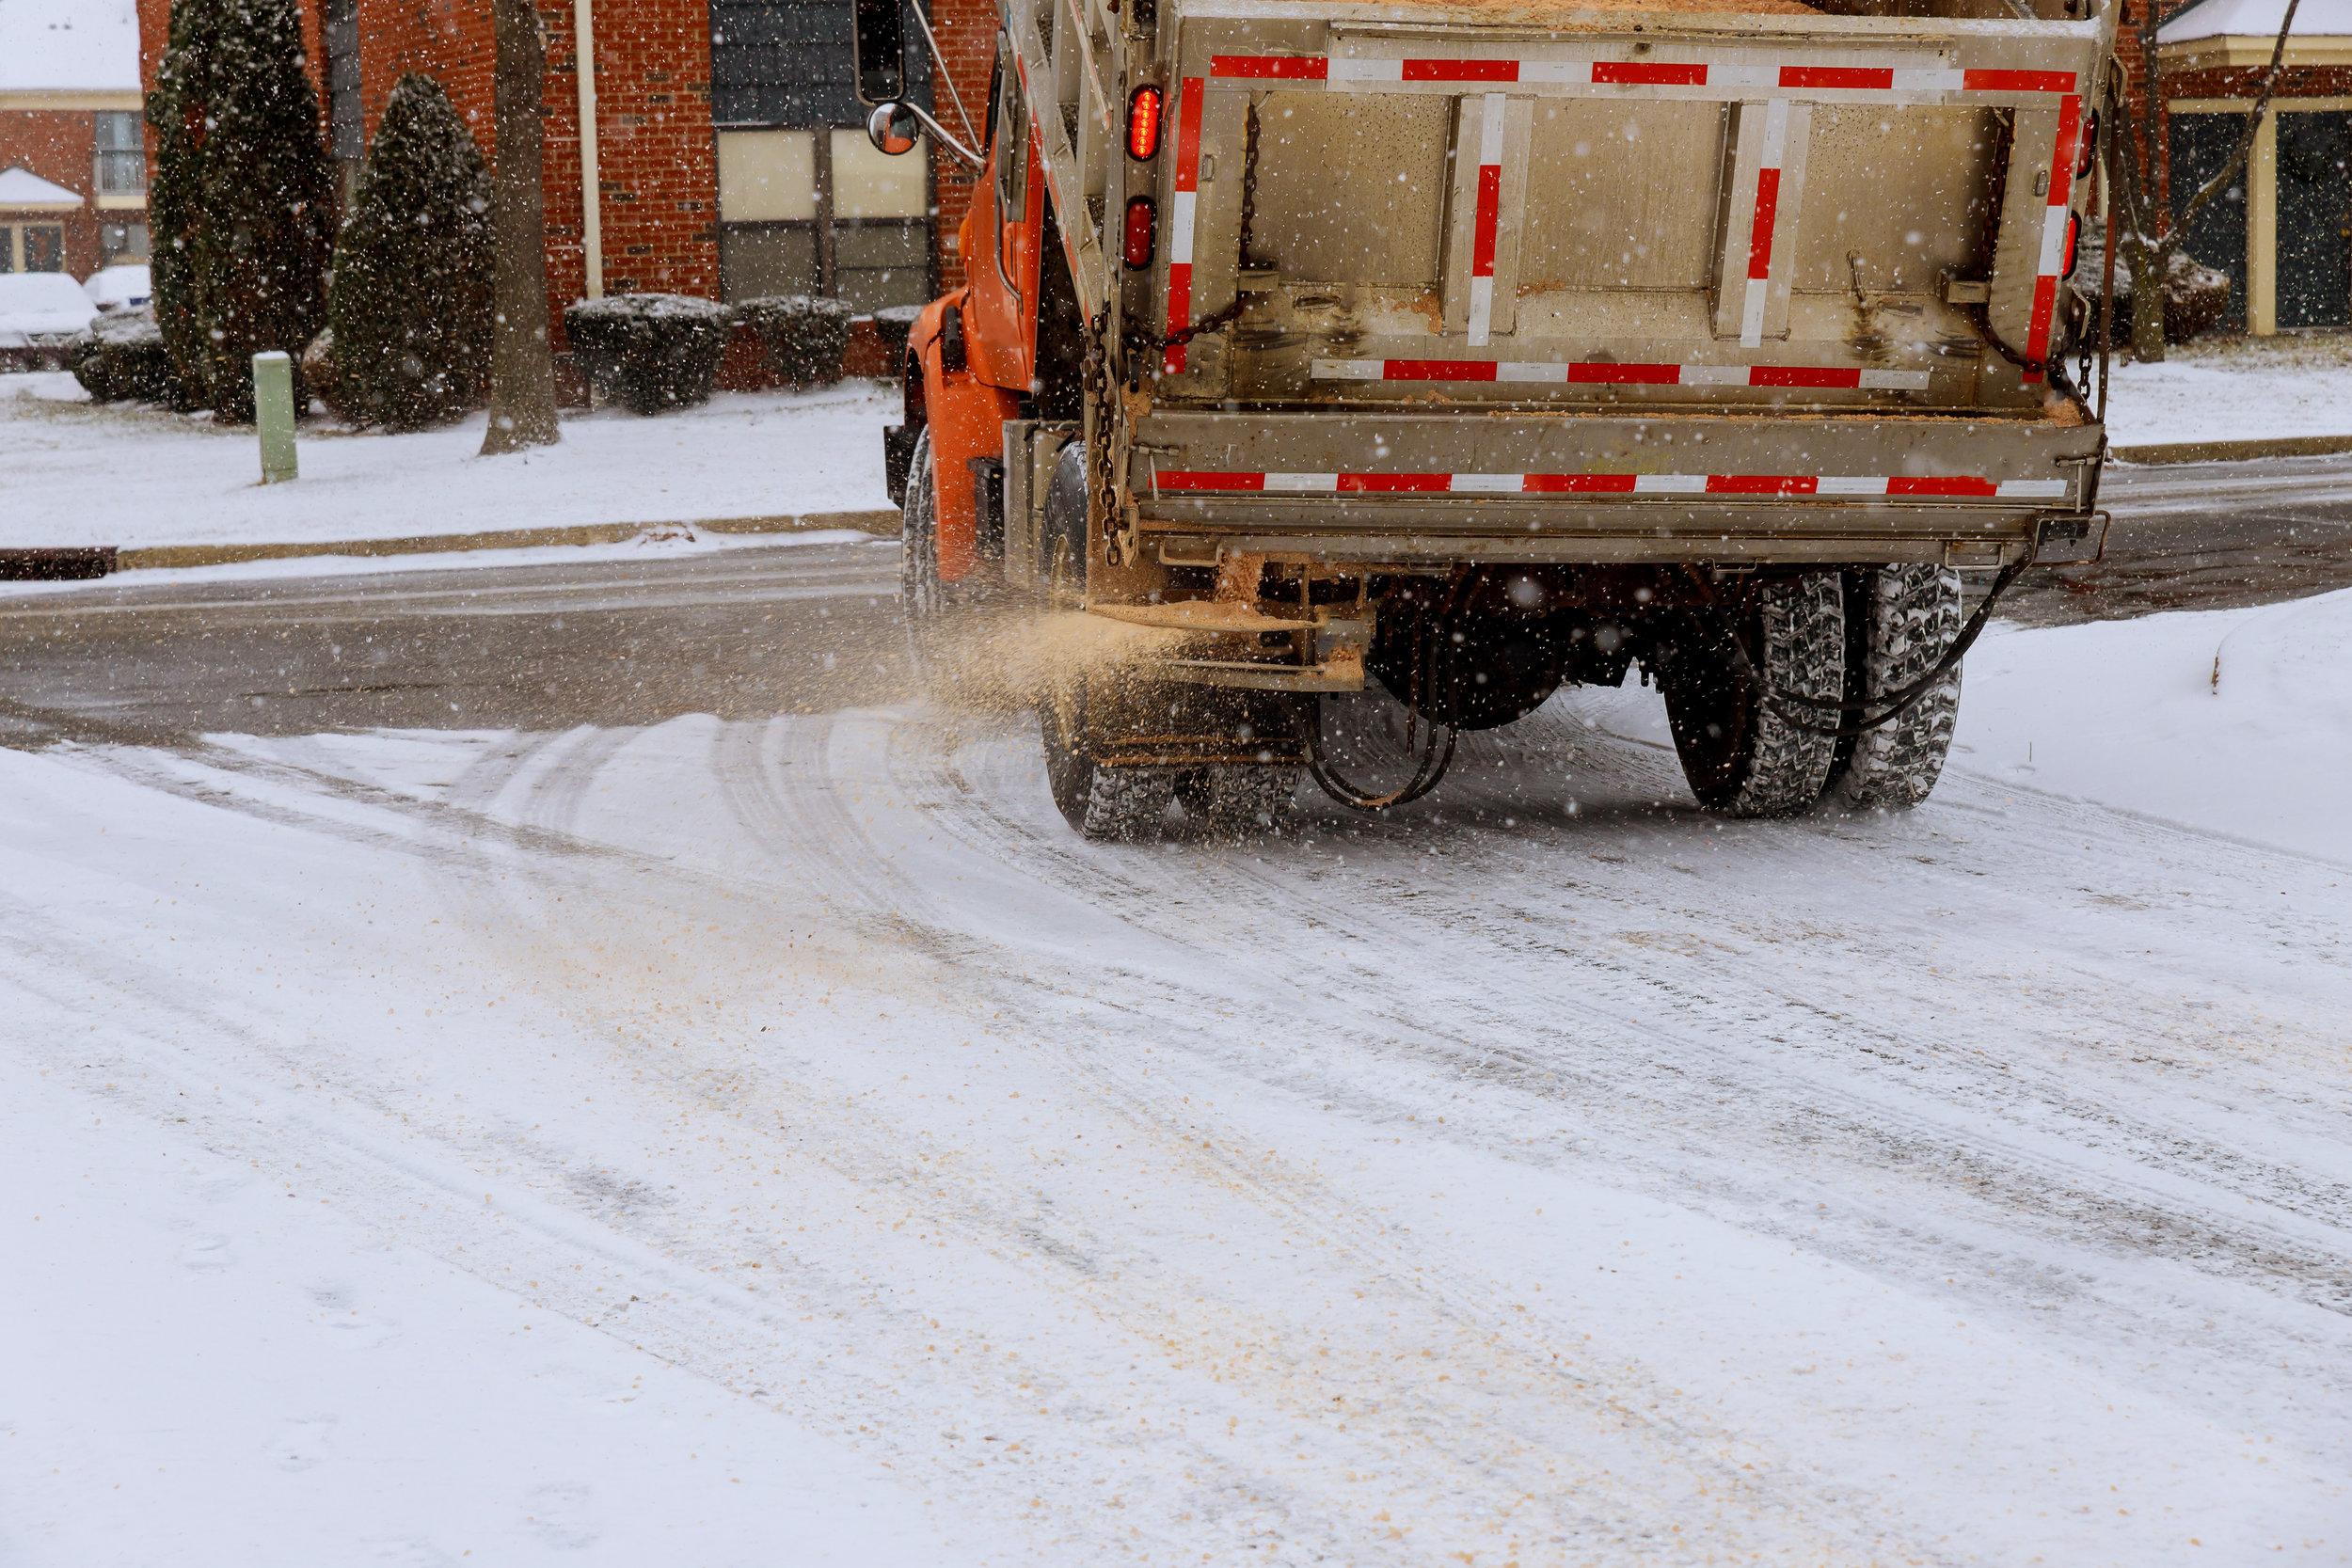 Road salt is impacting Accotink Creek's water quality